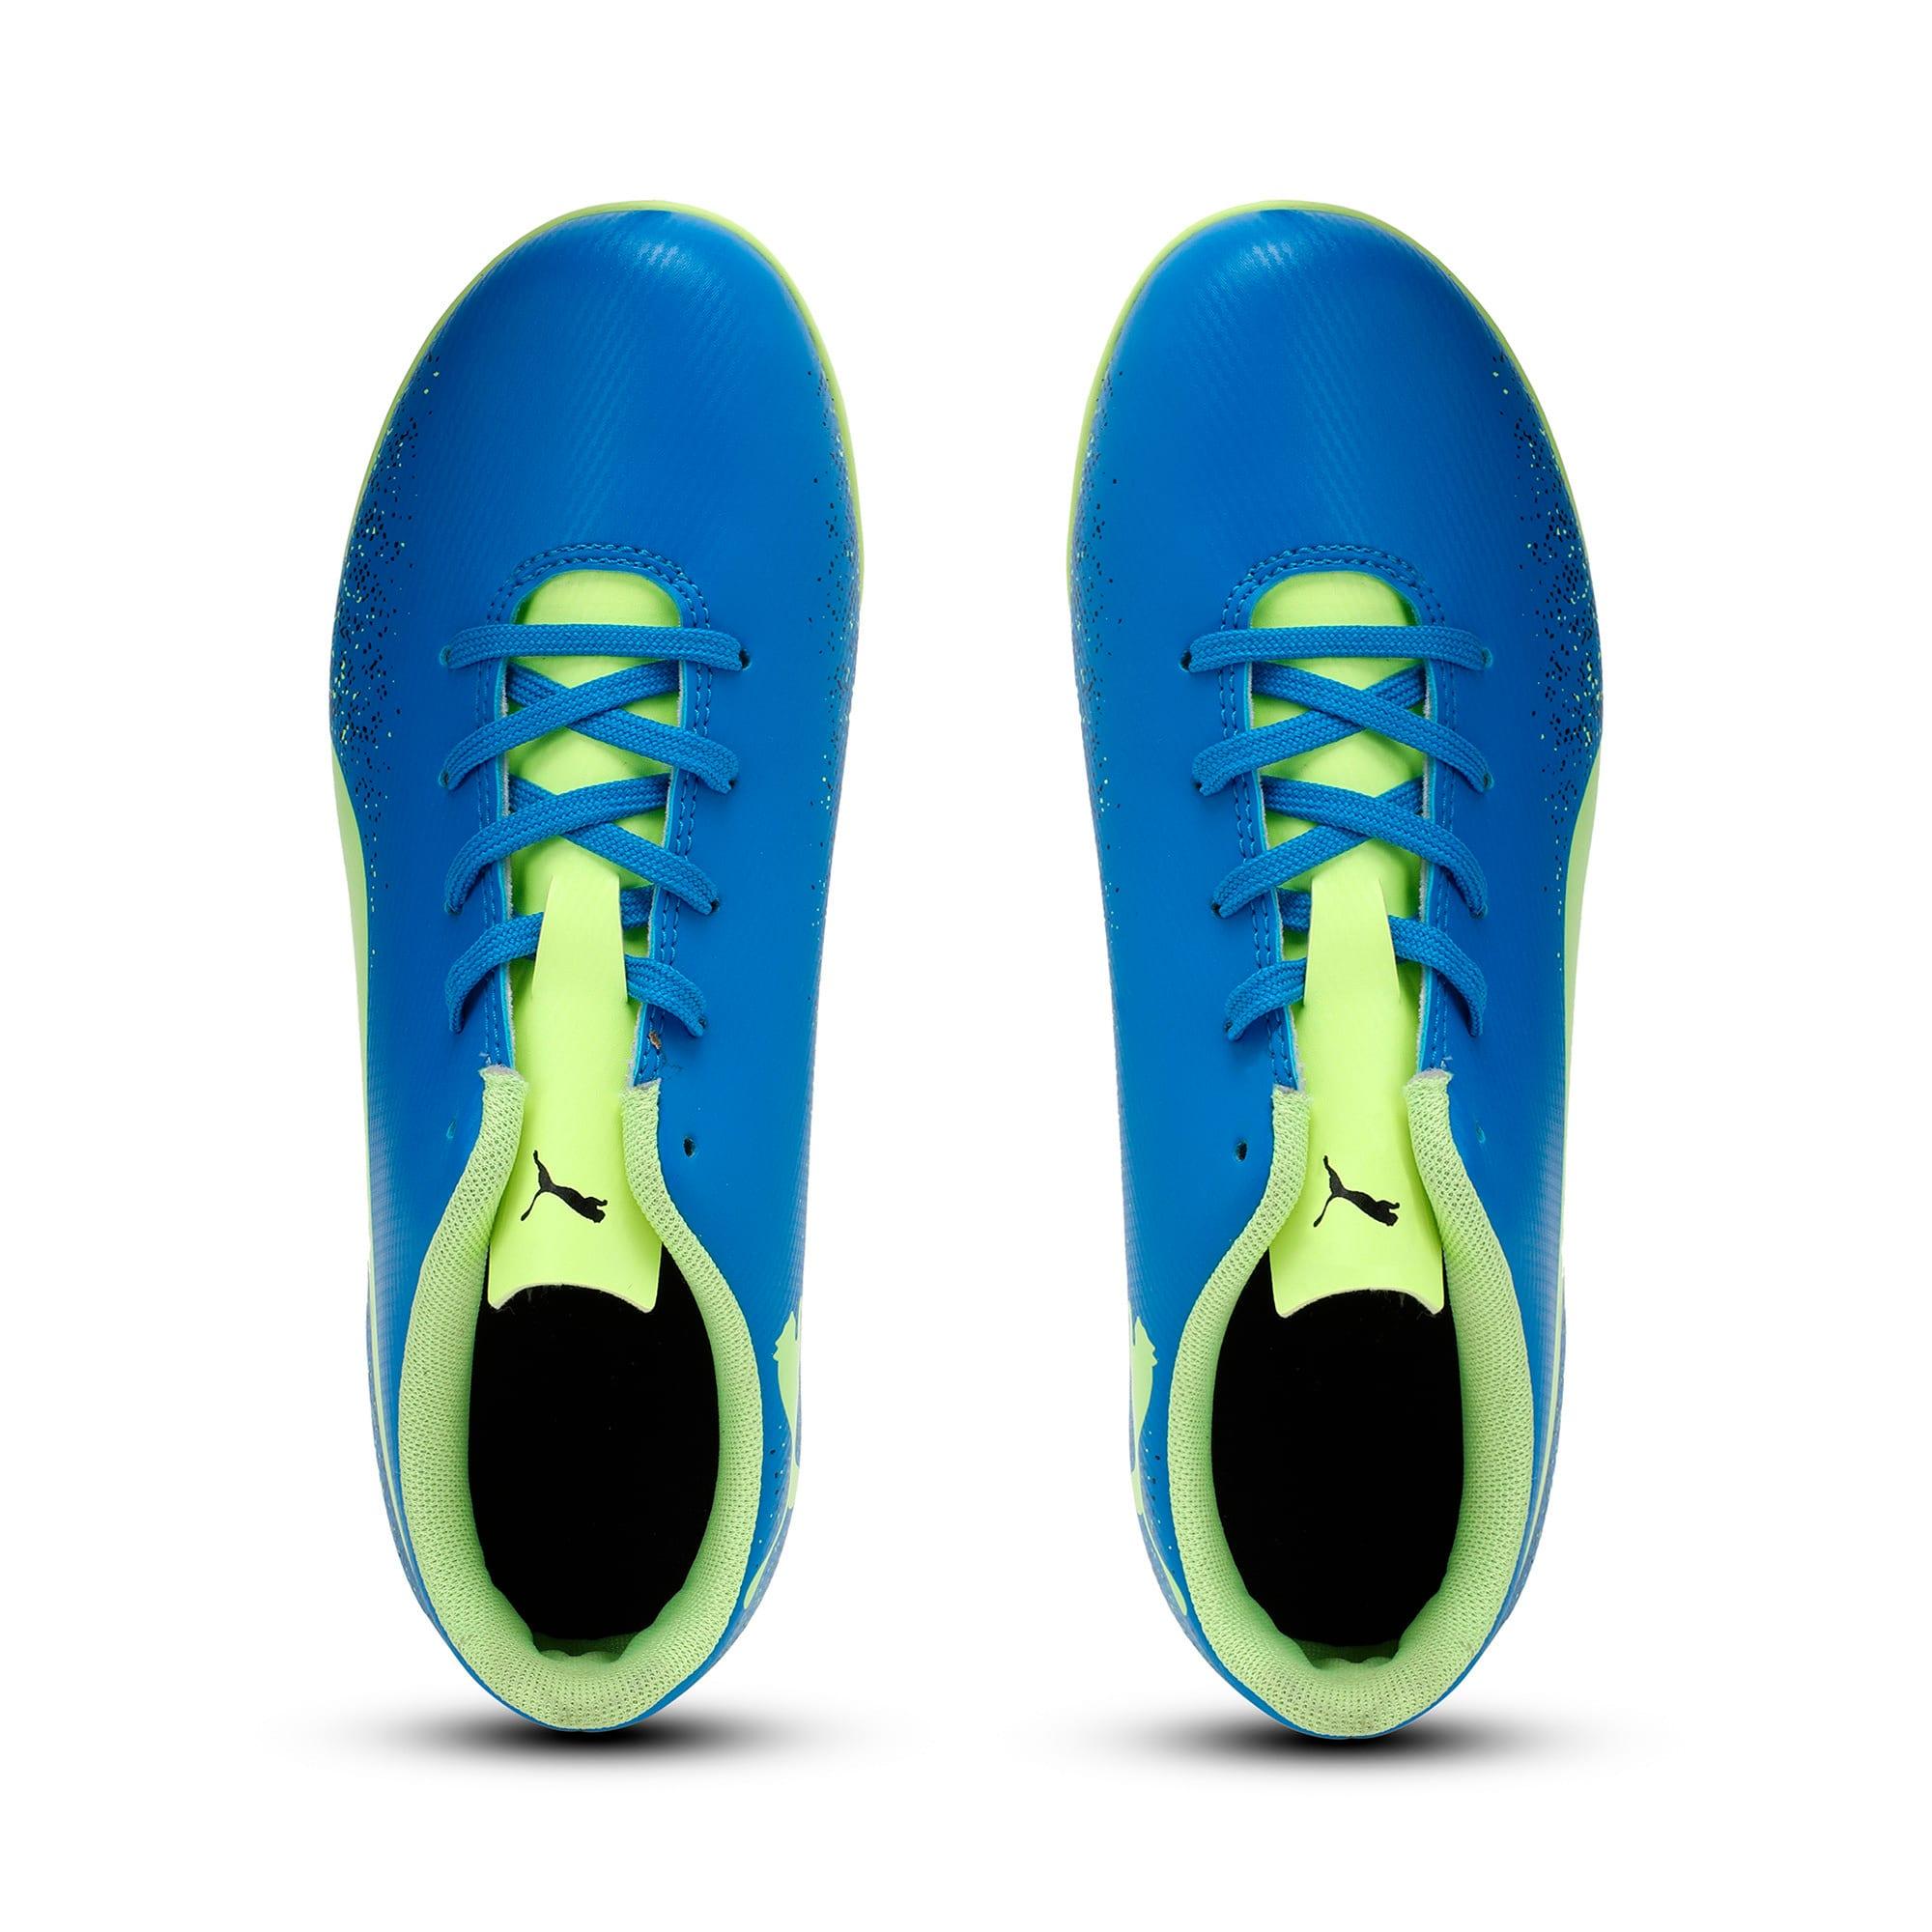 Thumbnail 6 of Truora TT Kids' Football Boots, Blue-Yellow-Black, medium-IND